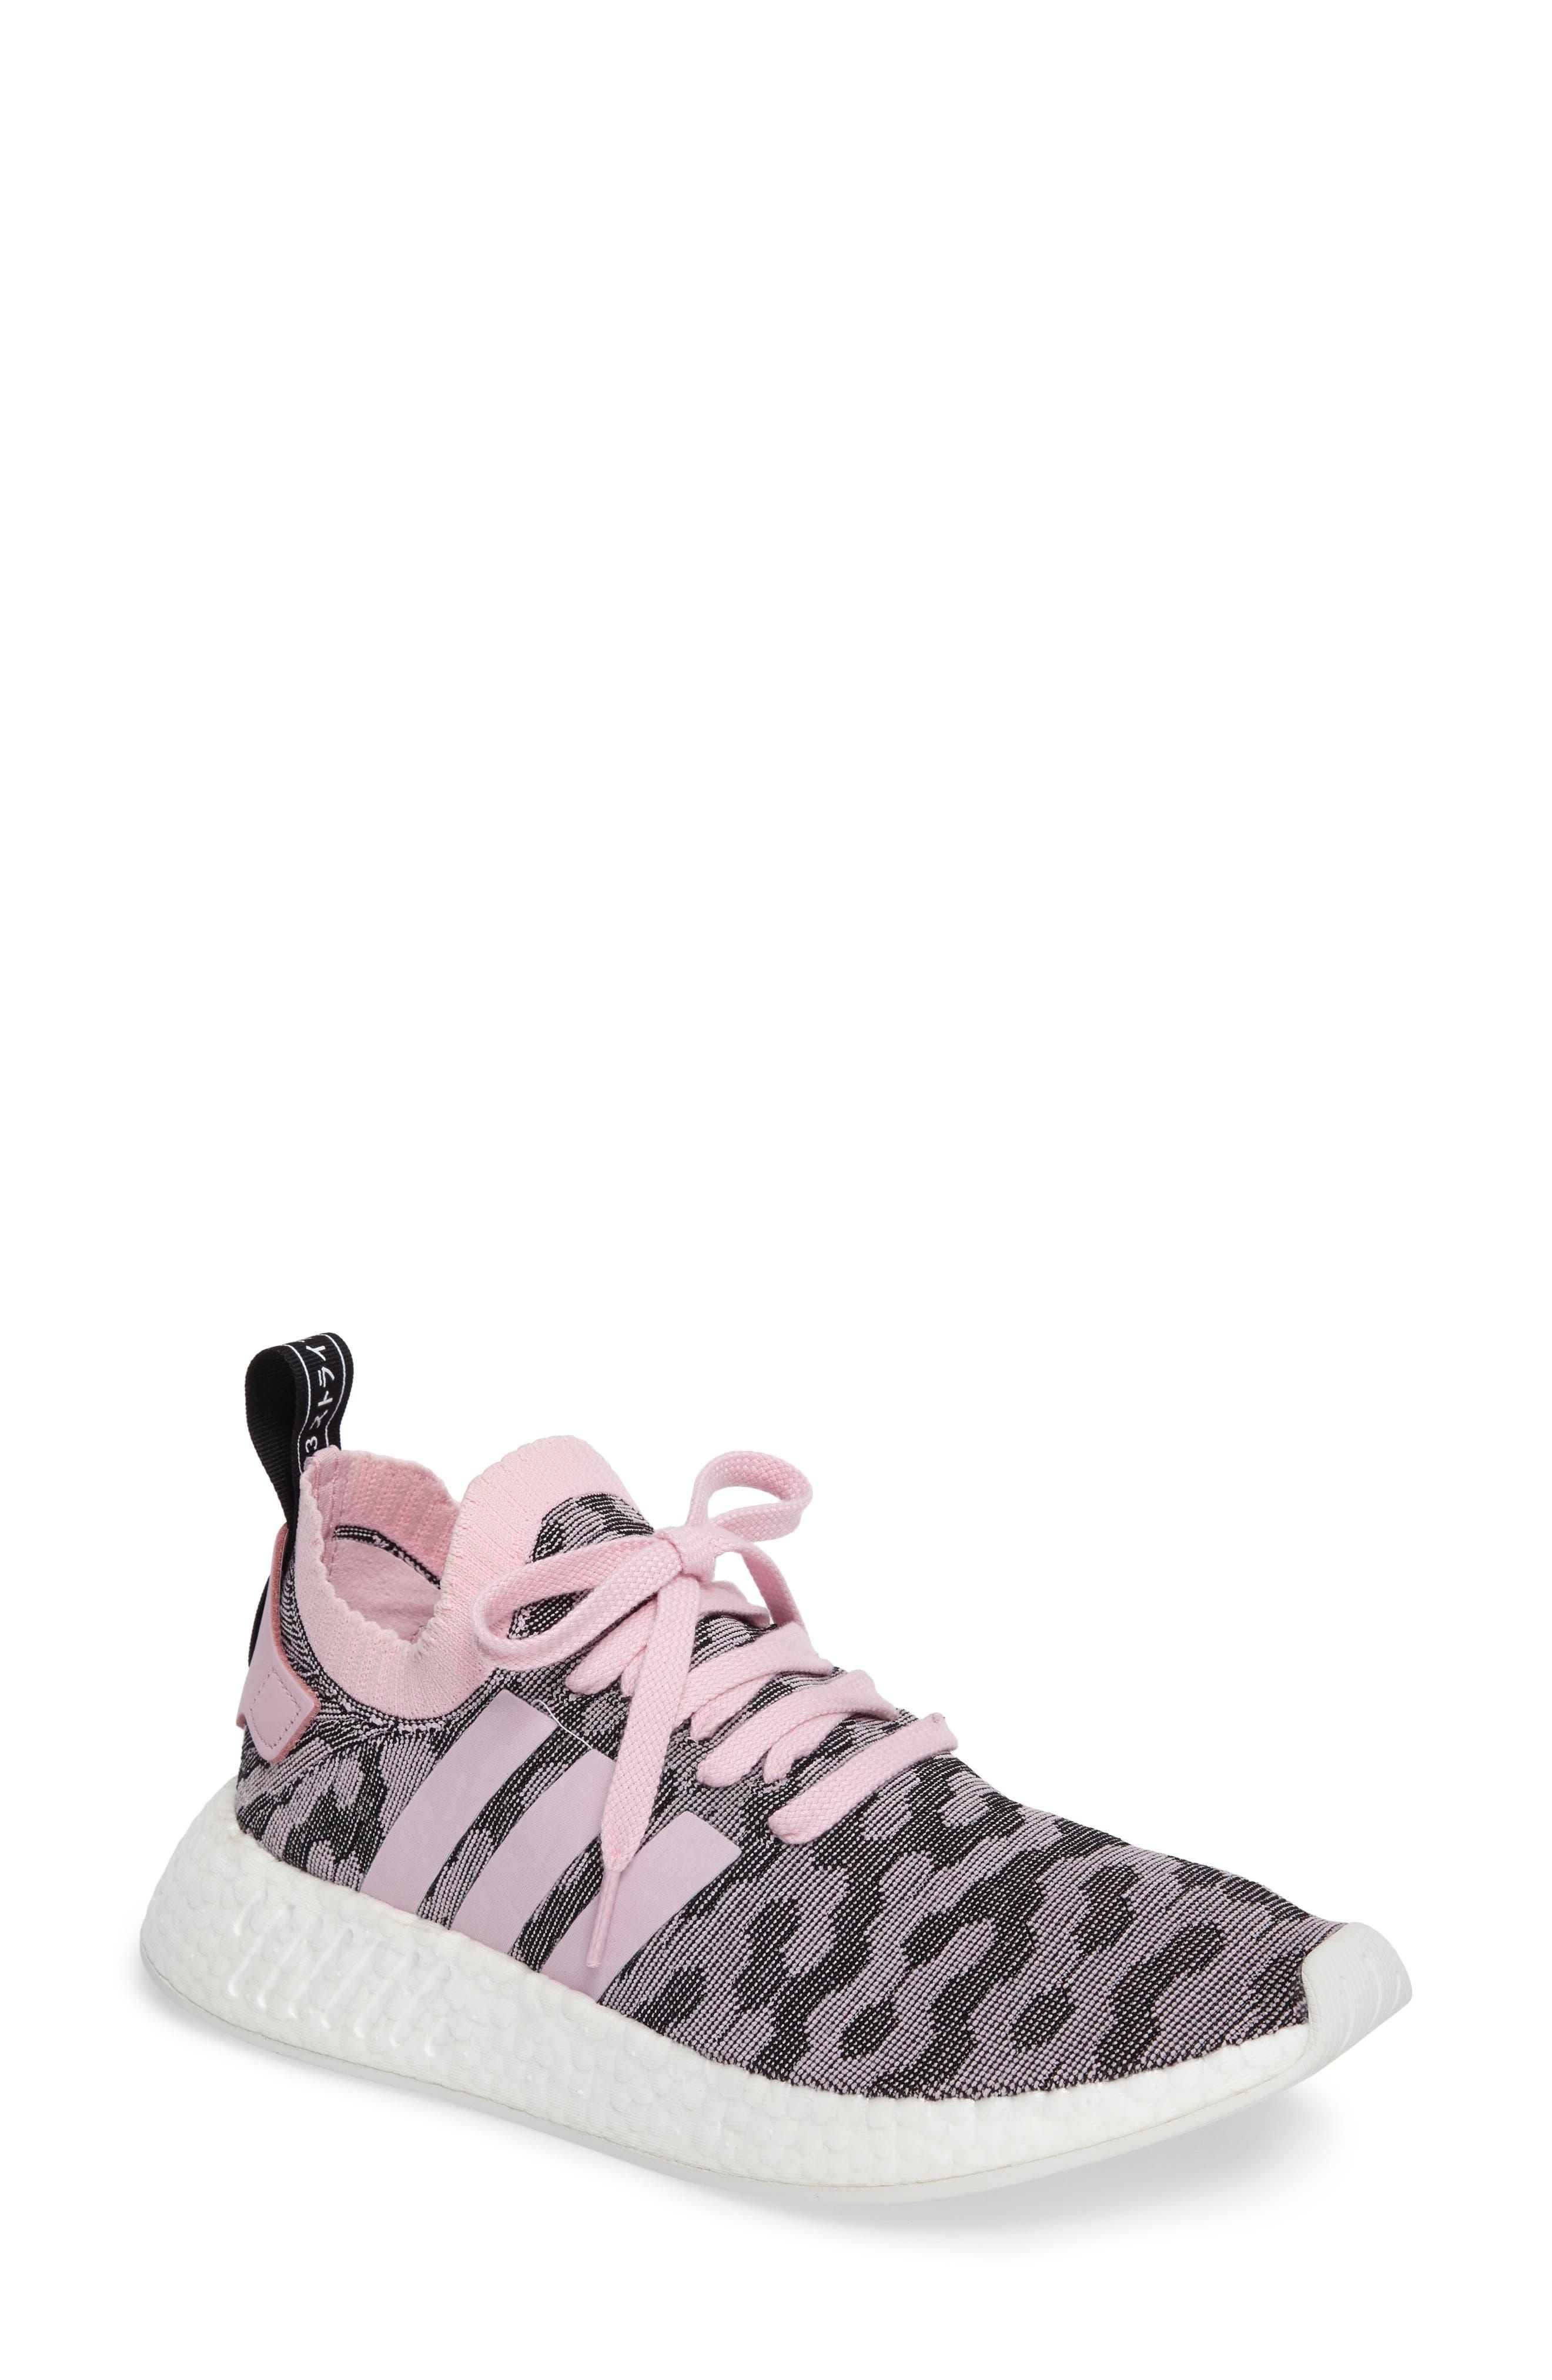 NMD R2 Primeknit Athletic Shoe,                             Main thumbnail 1, color,                             Wonder Pink/ Wonder Pink